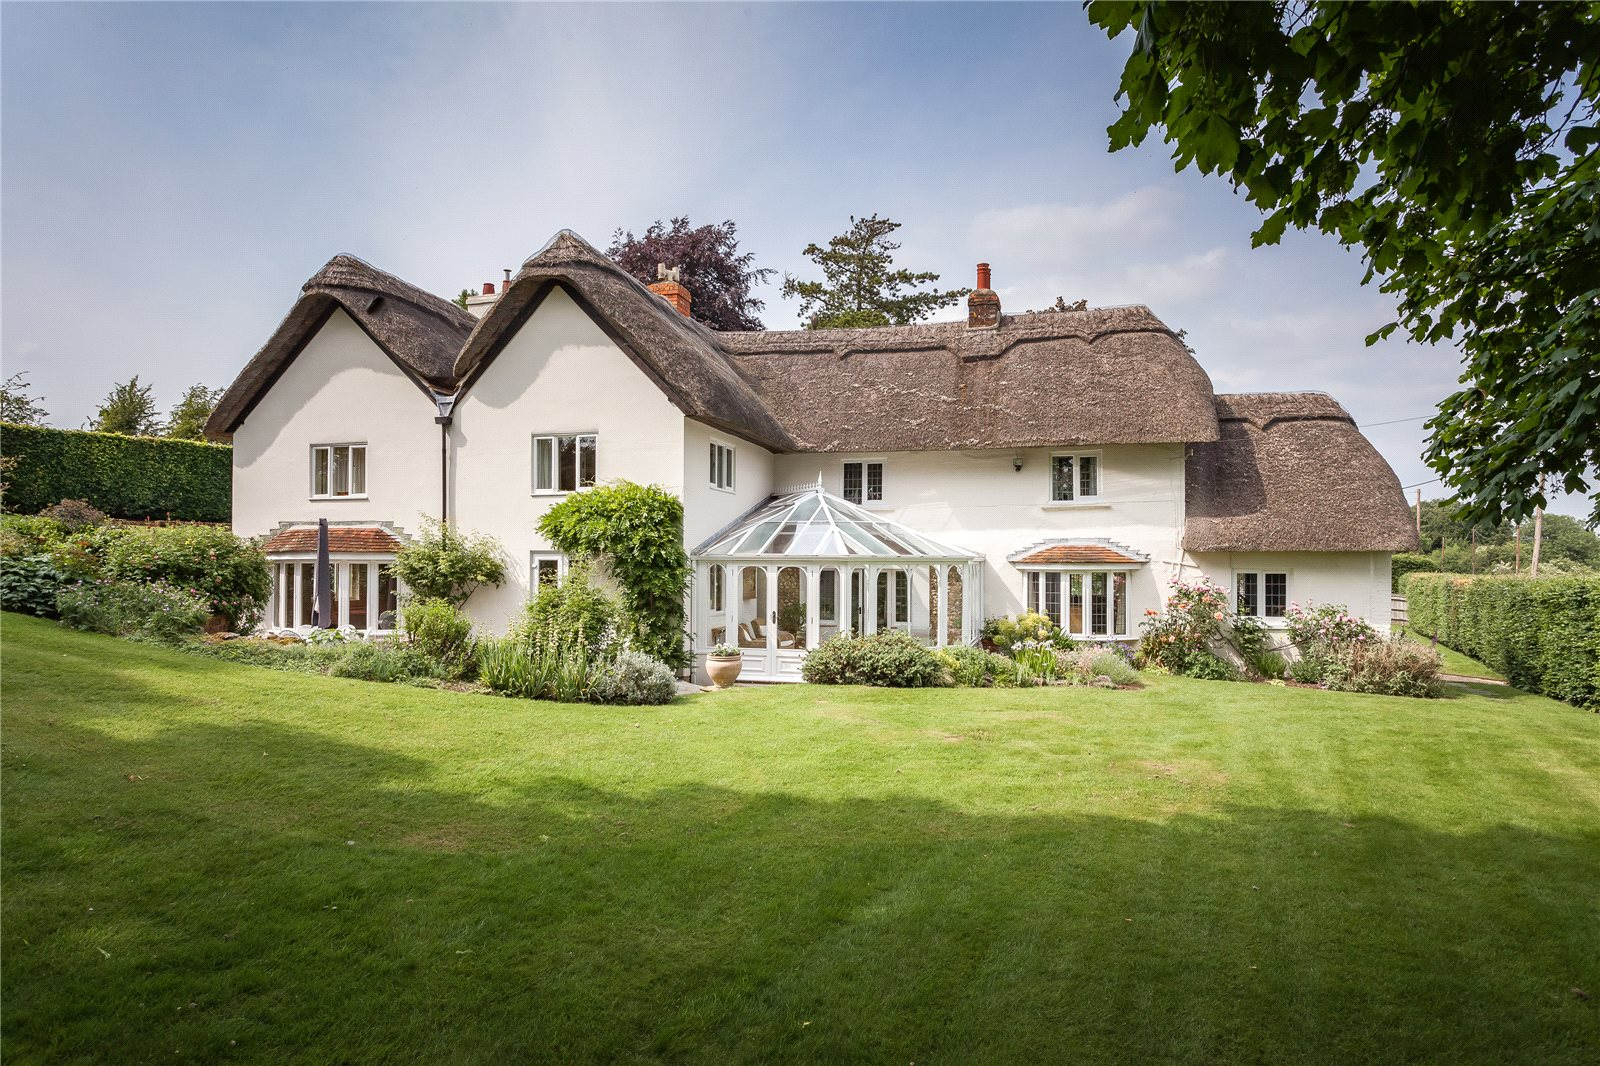 Casa para uma família para Venda às Longstock, Stockbridge, Hampshire, SO20 Stockbridge, Inglaterra